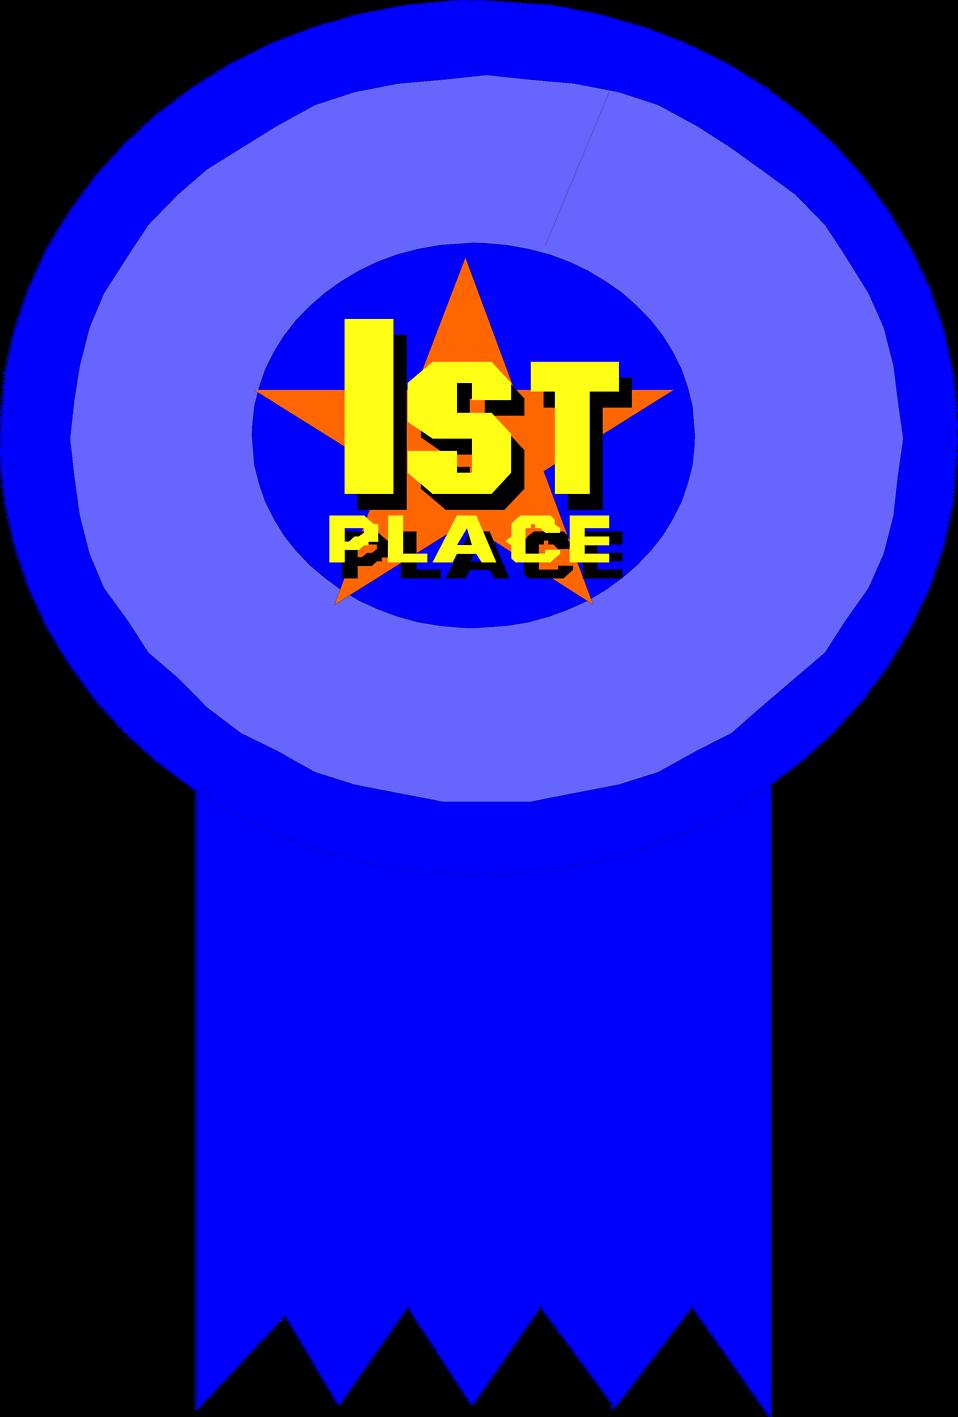 Prize clipart appreciation award.  st place ribbon